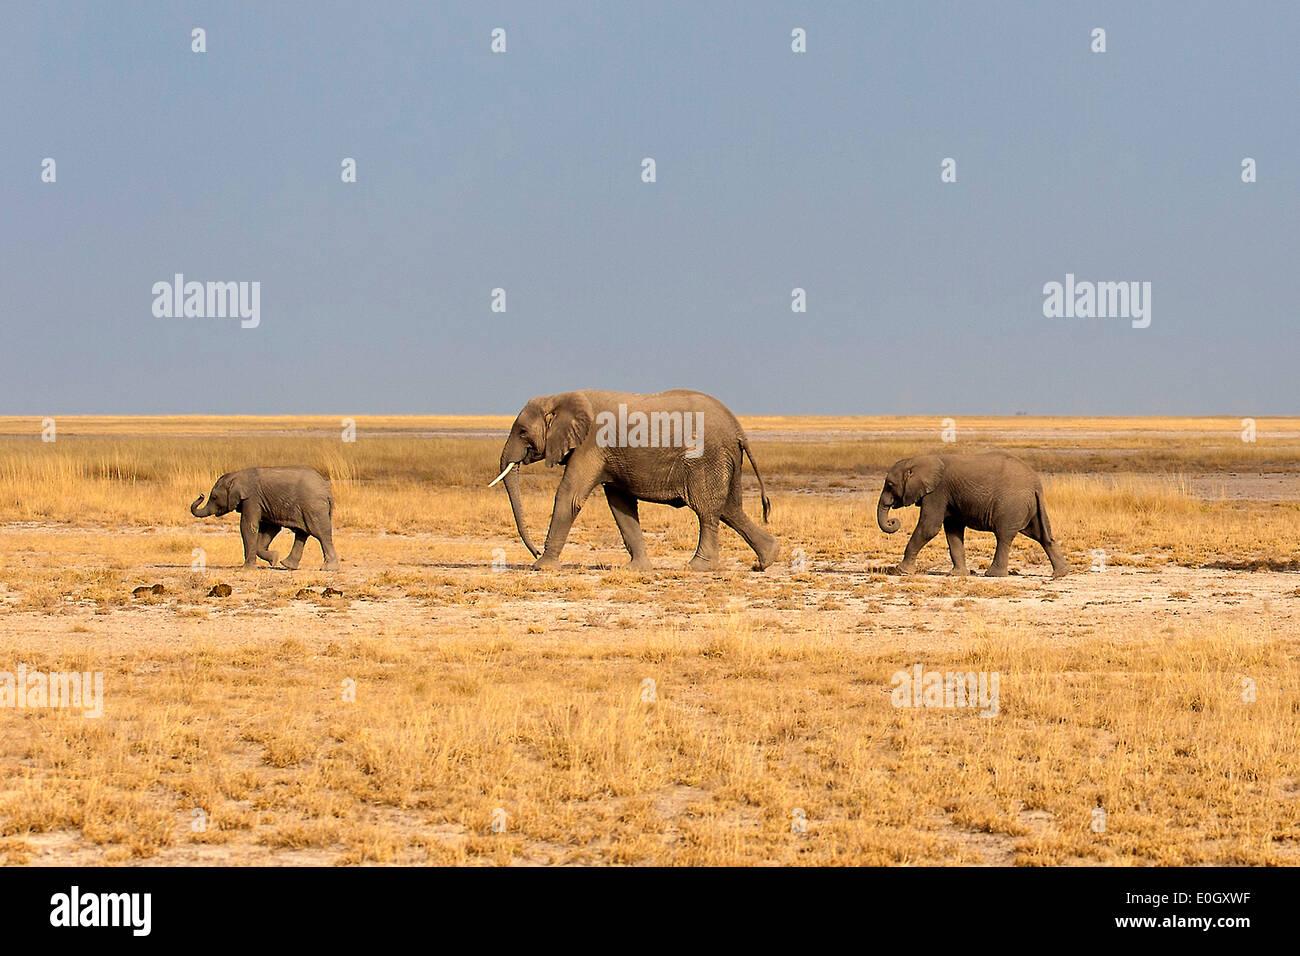 African elephants in Amboseli Nationwide park, Kenya., African elephants in Amboseli National Park - Stock Image